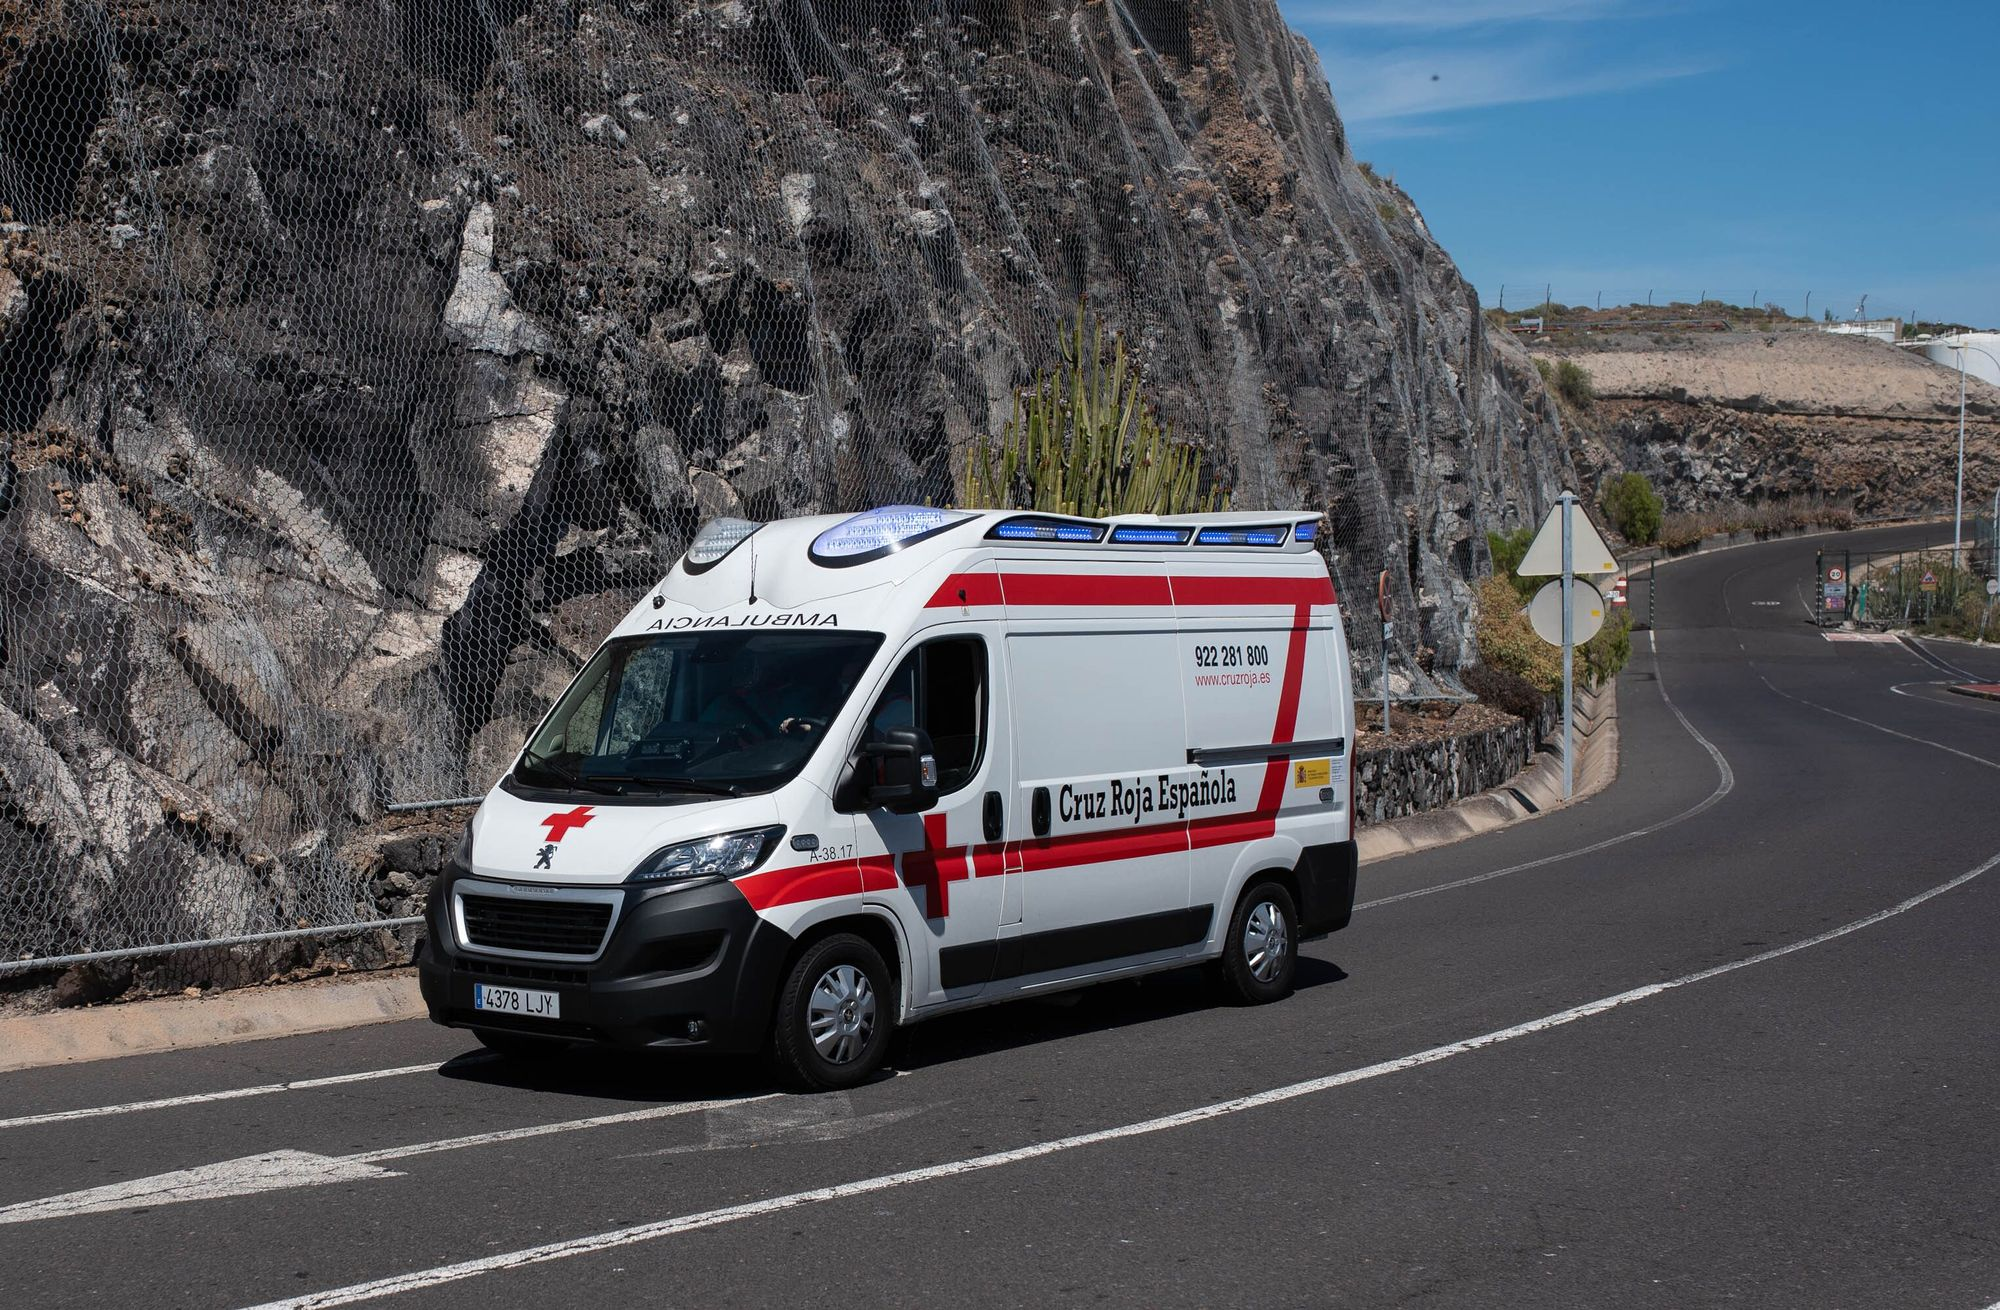 Operativo de emergencia migratoria en Tenerife